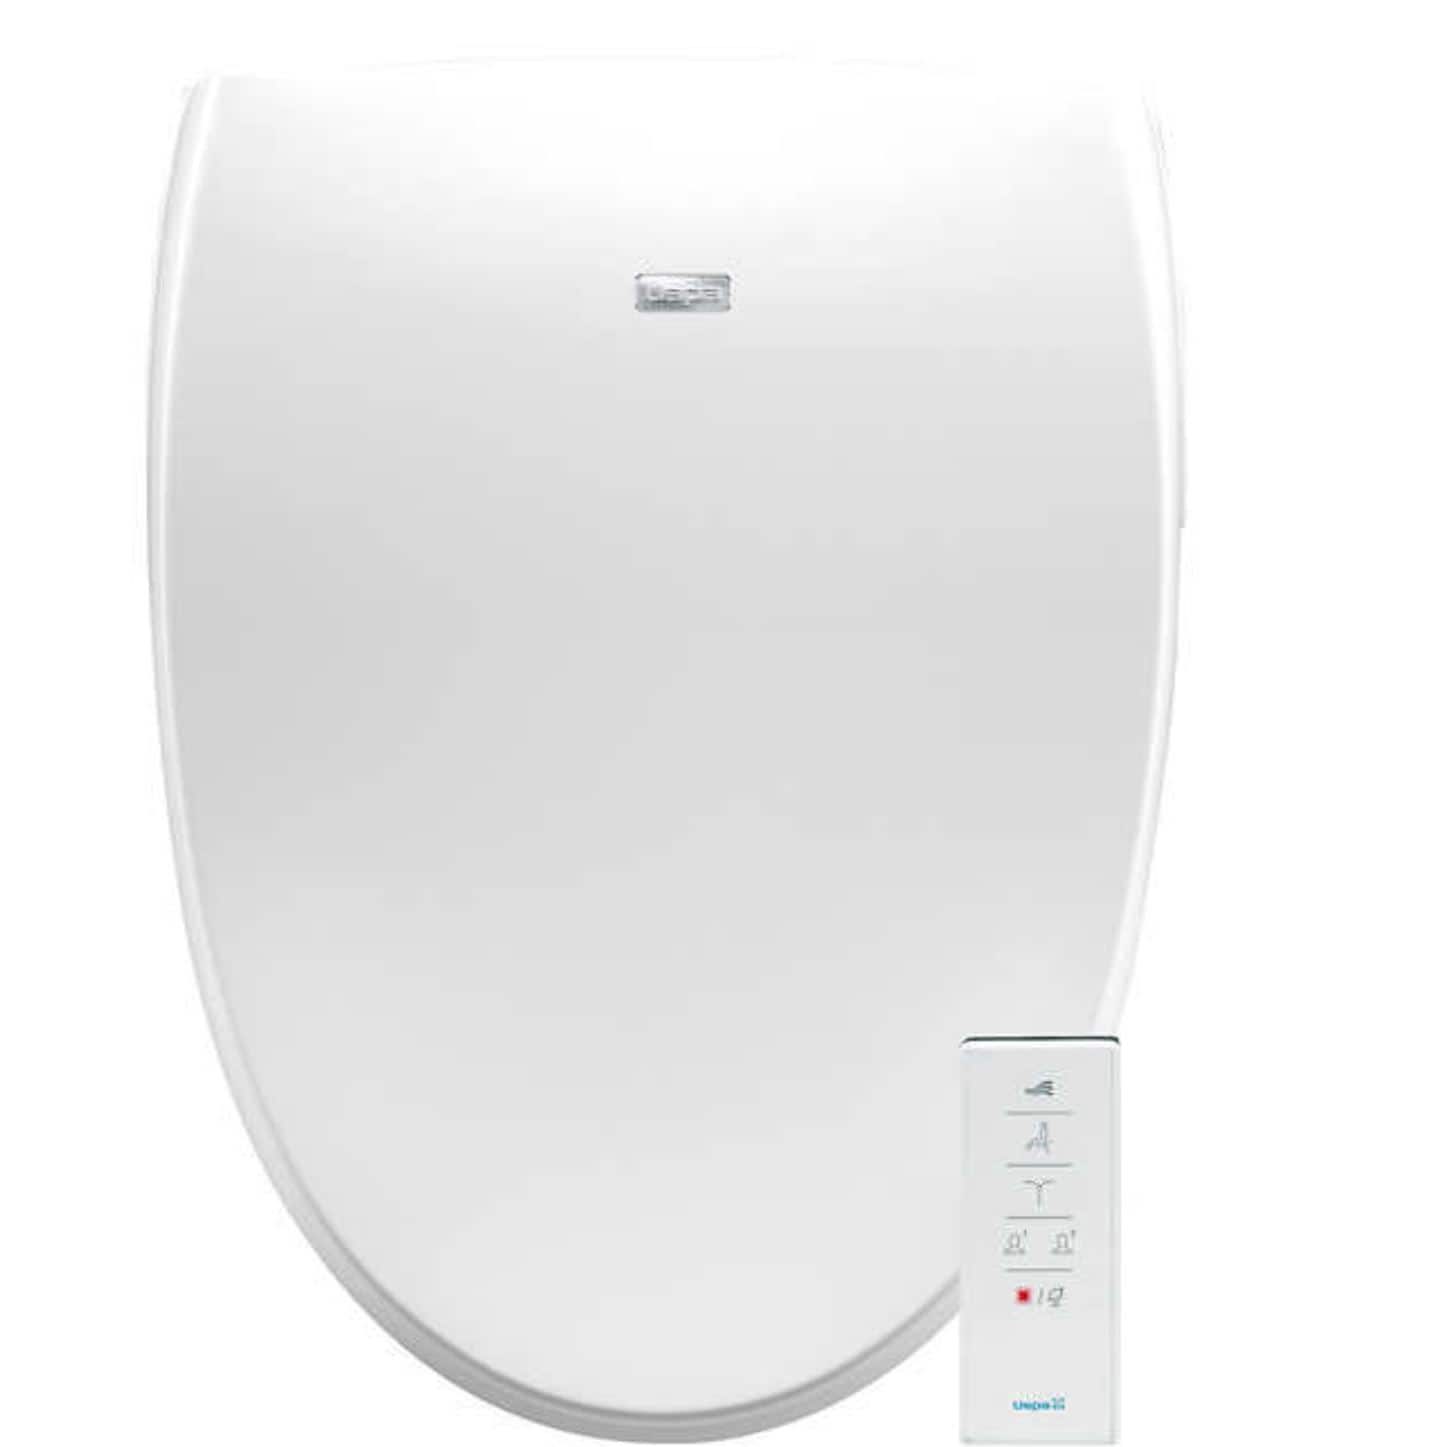 Fabulous Costco Wholesale Bio Bidet A8 Serenity Smart Bidet Toilet Ibusinesslaw Wood Chair Design Ideas Ibusinesslaworg